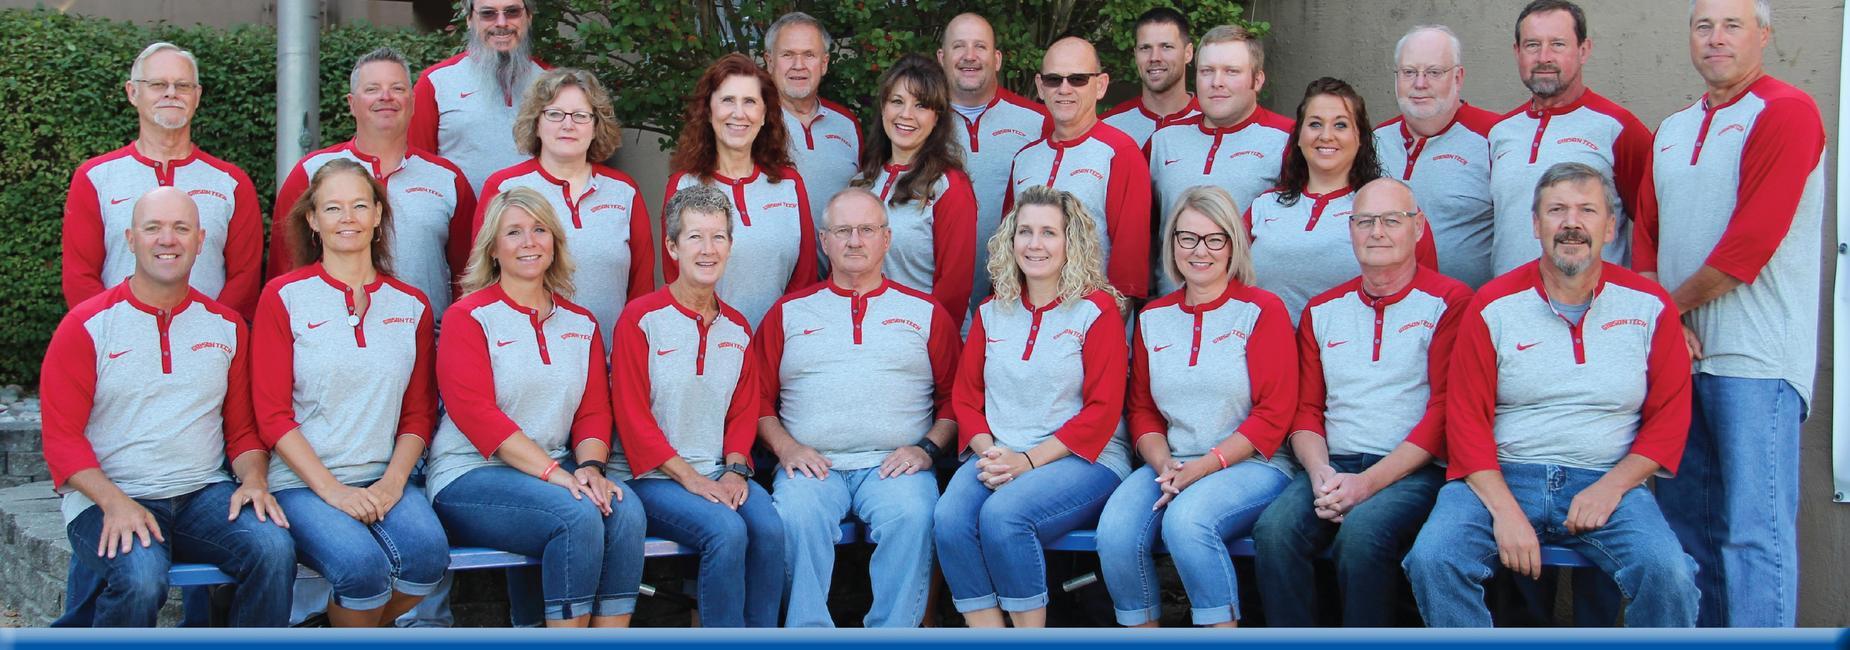 2019 GTC Staff